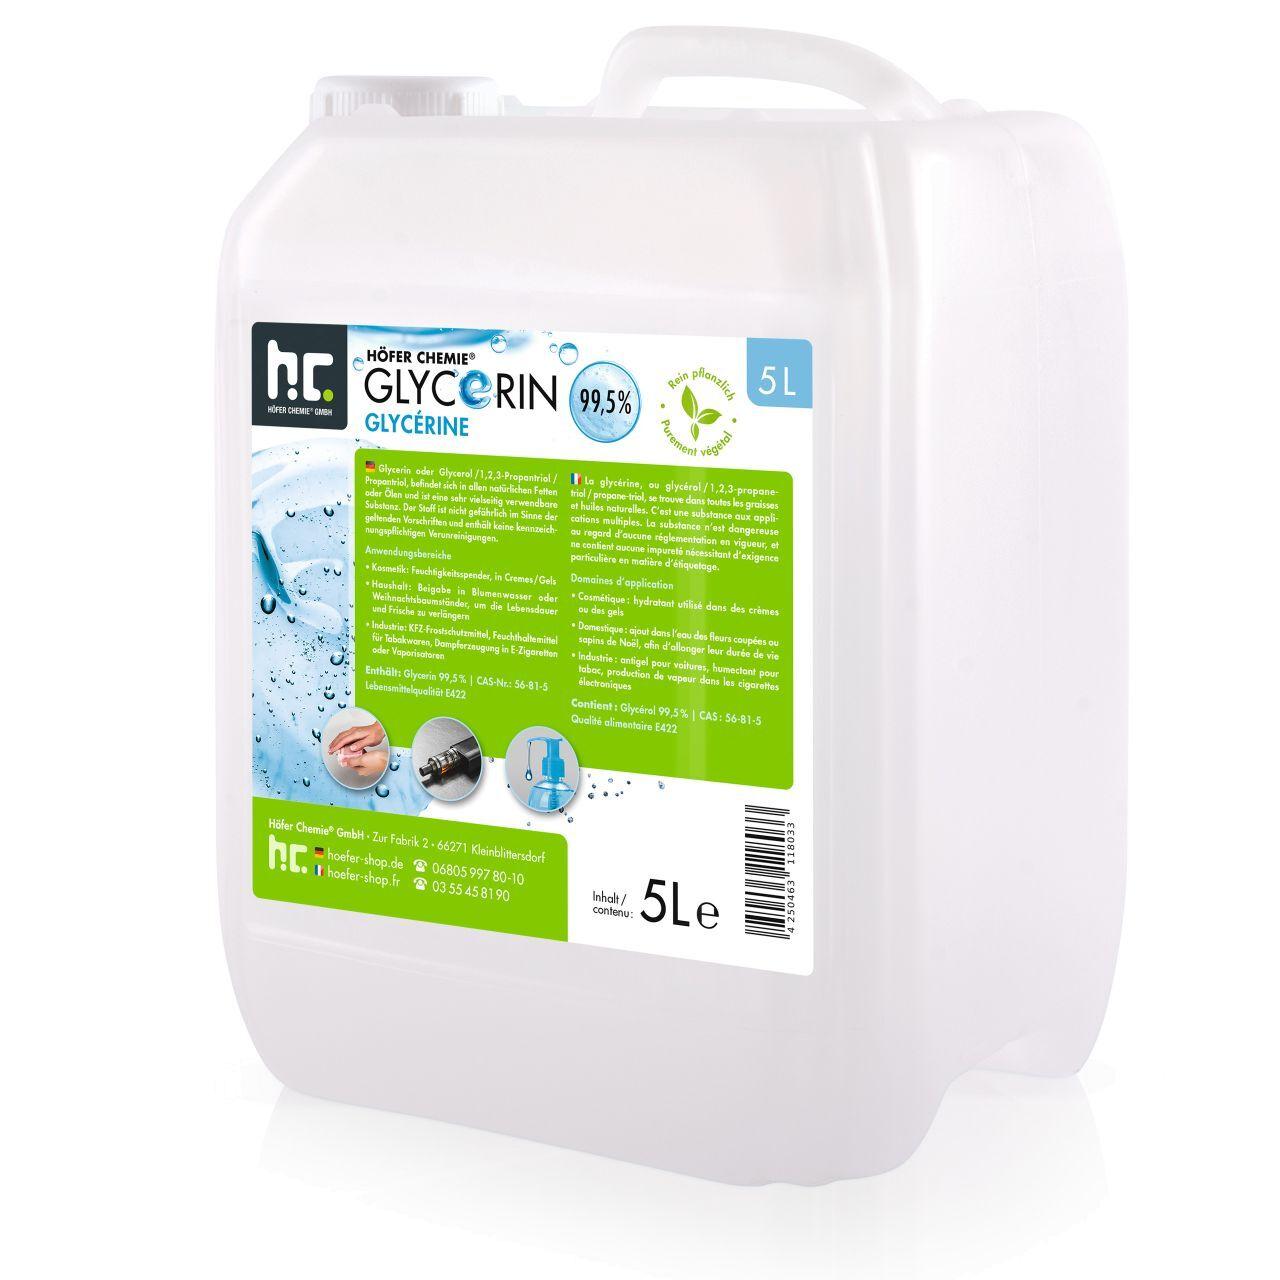 Höfer Chemie 20 l Glycerin 99,5% in Lebensmittelqualität (4 x 5 l)